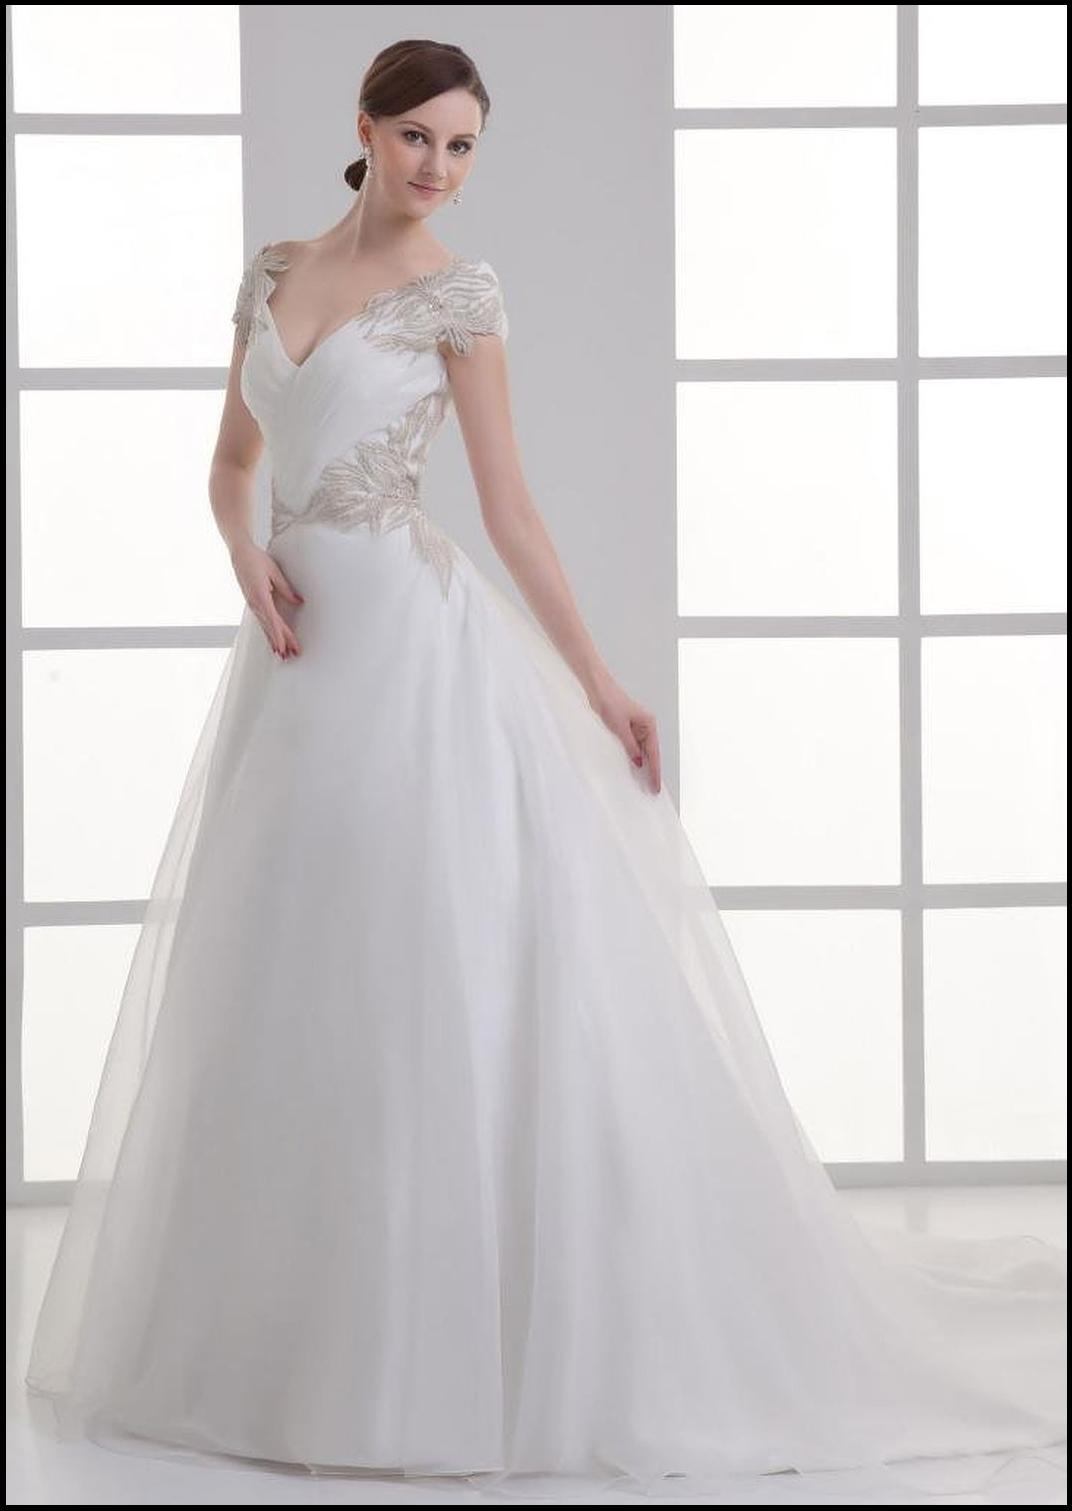 weddings princess style wedding dresses BRIDAL DRESS PRINCESS STYLE